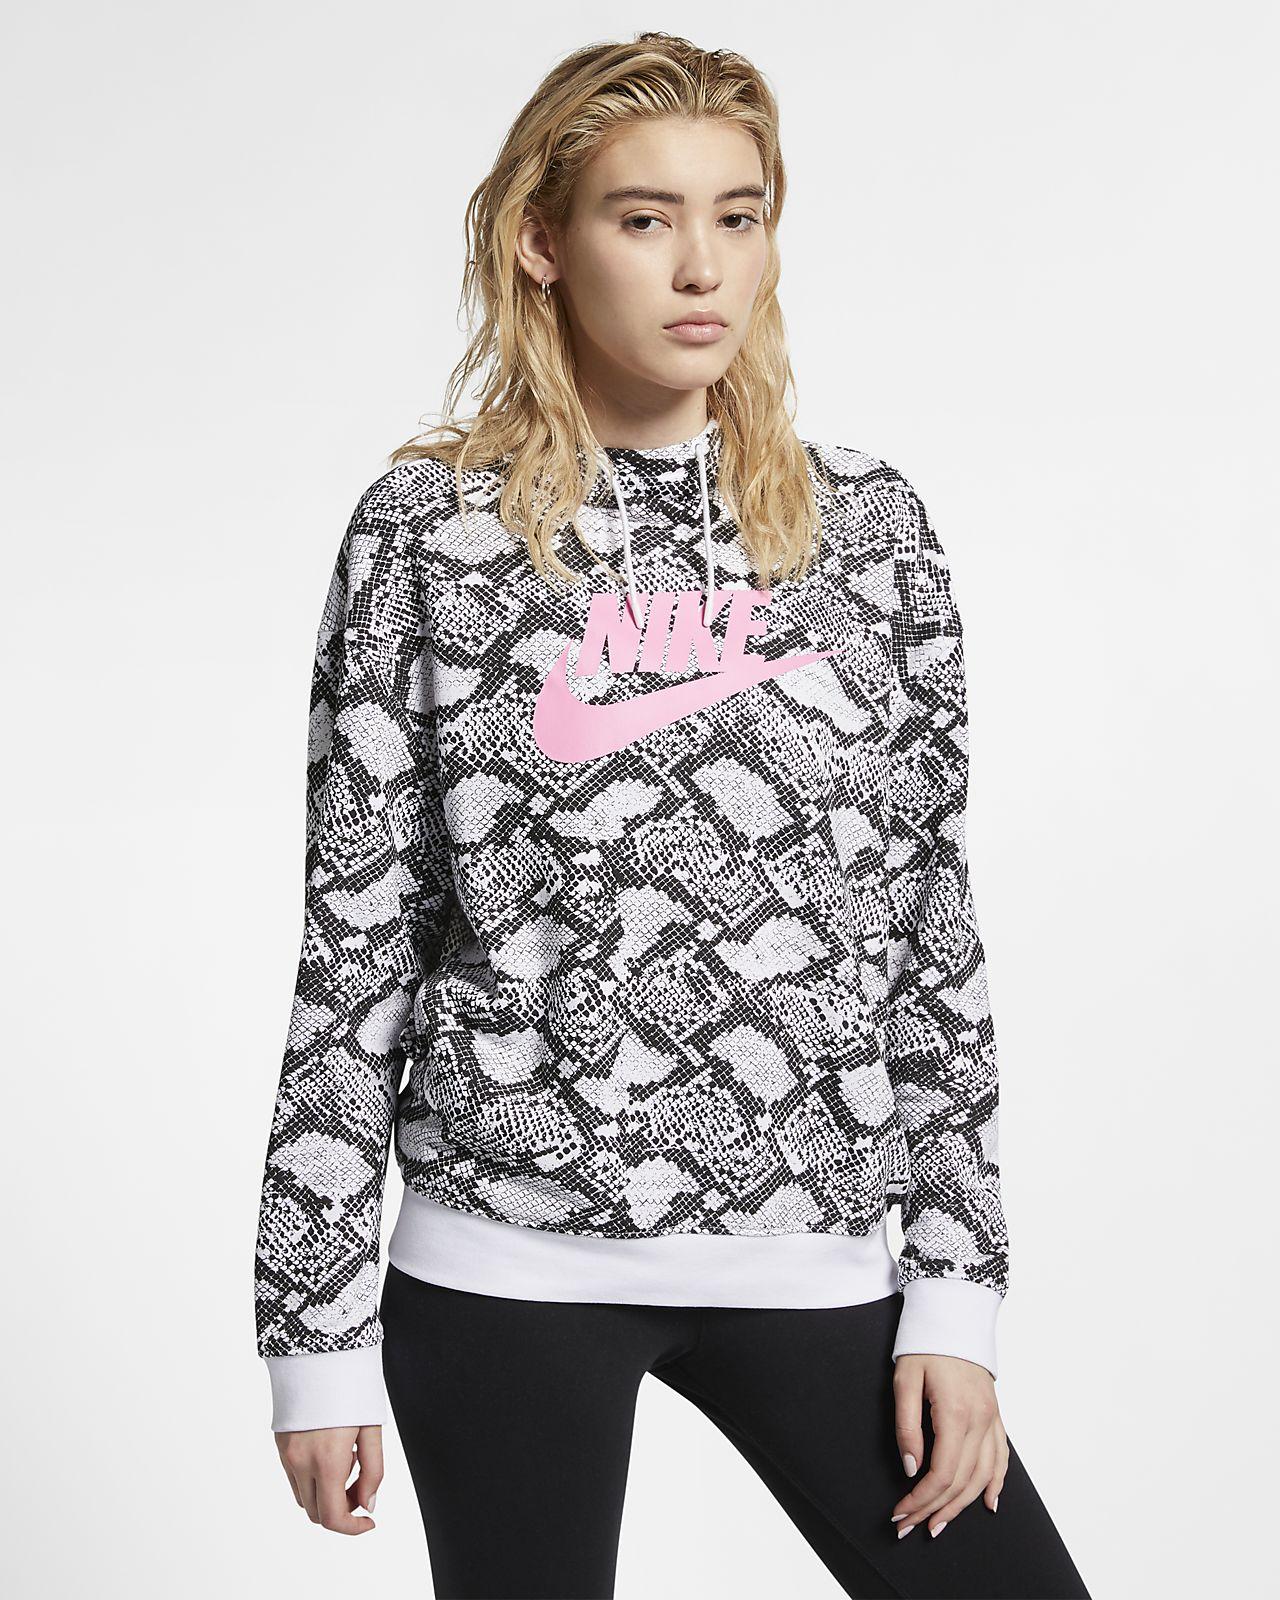 Sweat à capuche à imprimé animal Nike Sportswear pour Femme